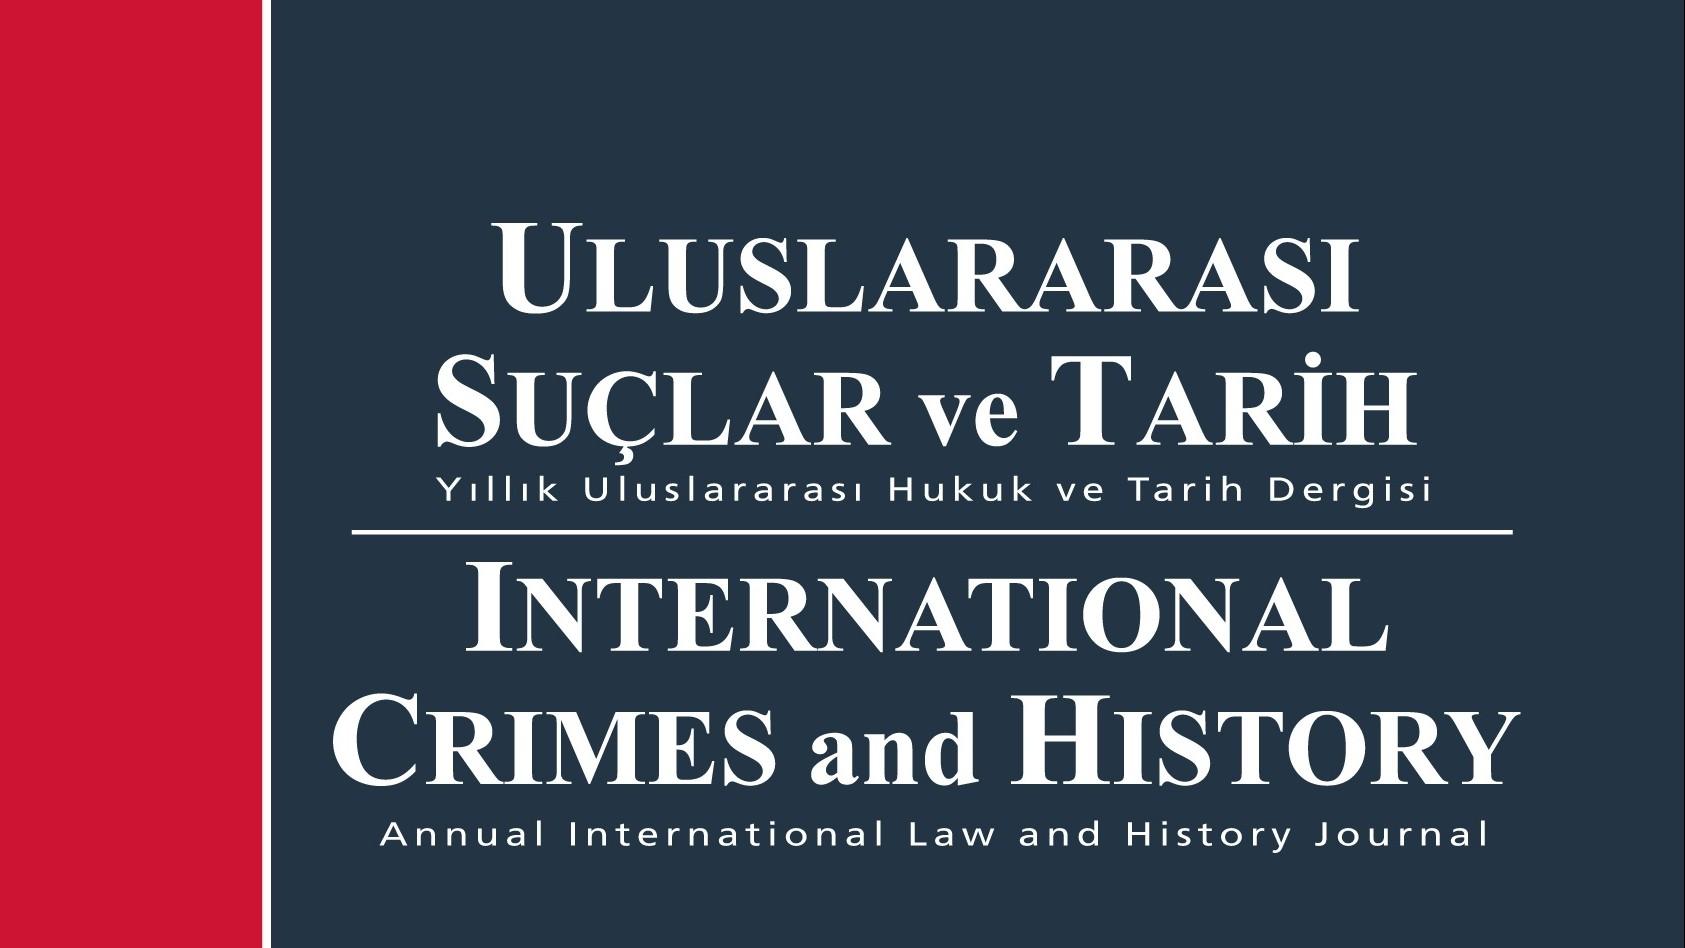 CALL FOR PAPERS: ULUSLARARASI SUÇLAR VE TARİH / INTERNATIONAL CRIMES AND HISTORY- 20TH ISSUE